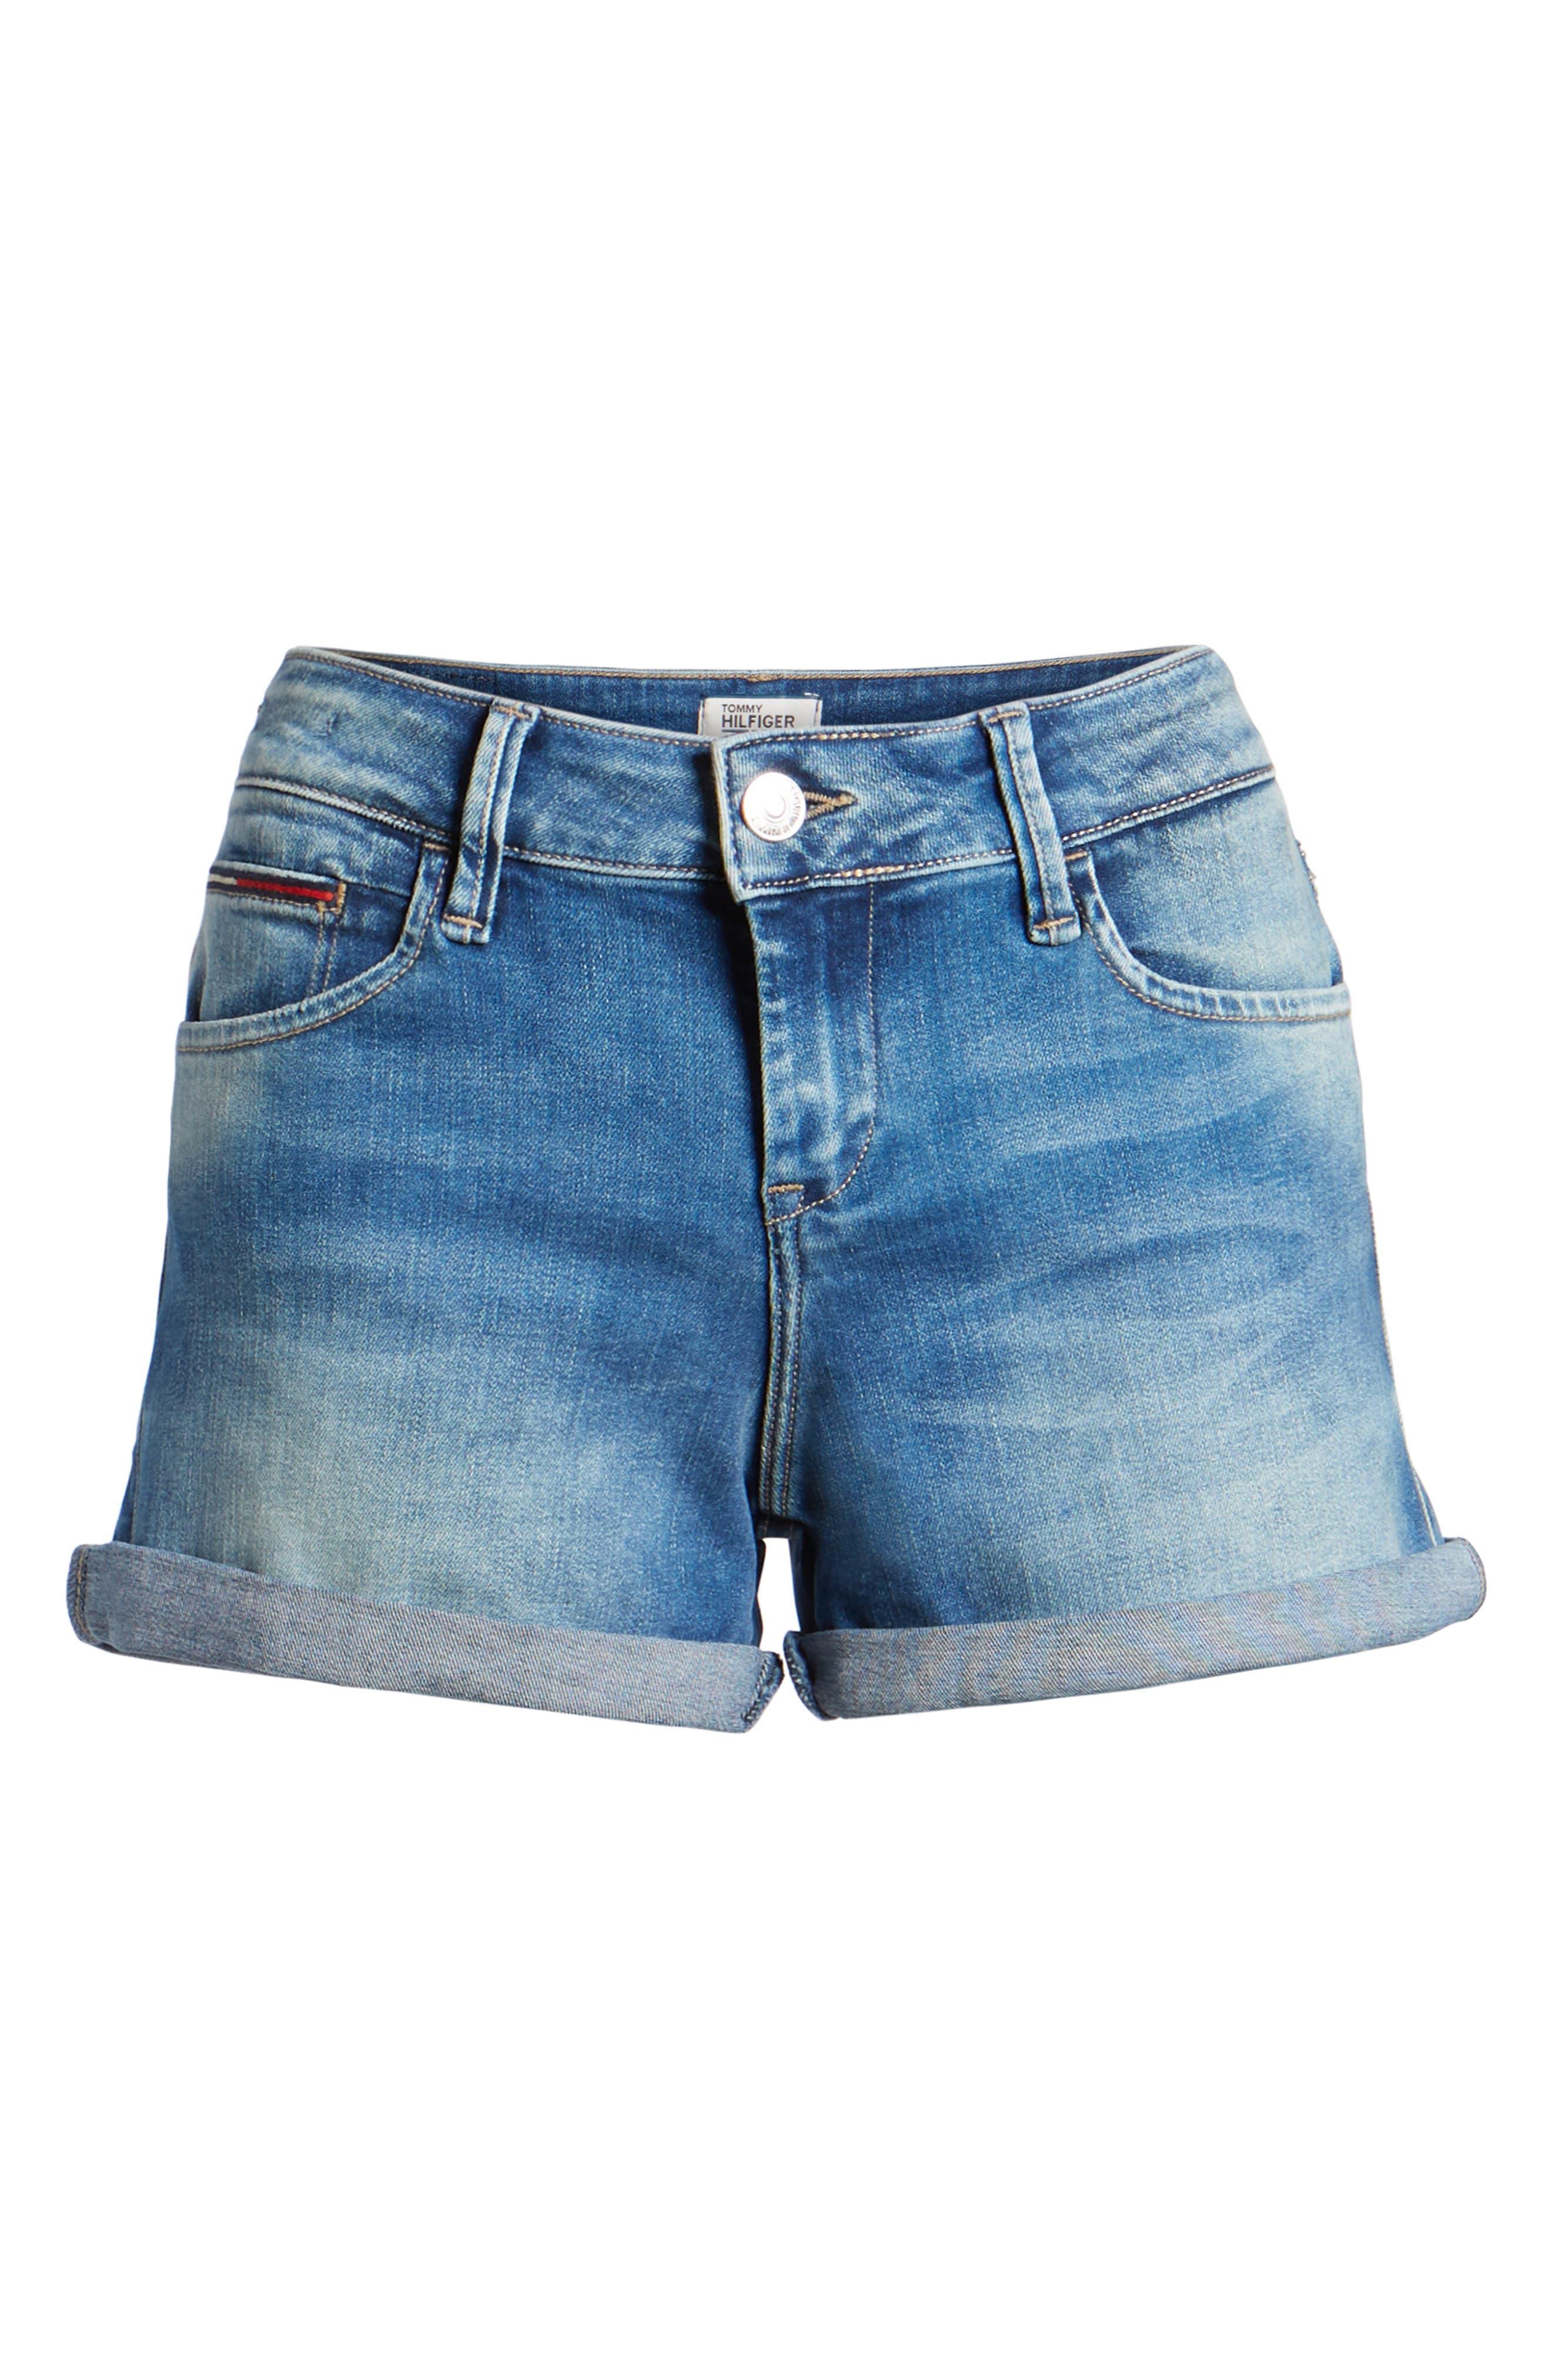 Cuffed Denim Shorts,                             Alternate thumbnail 7, color,